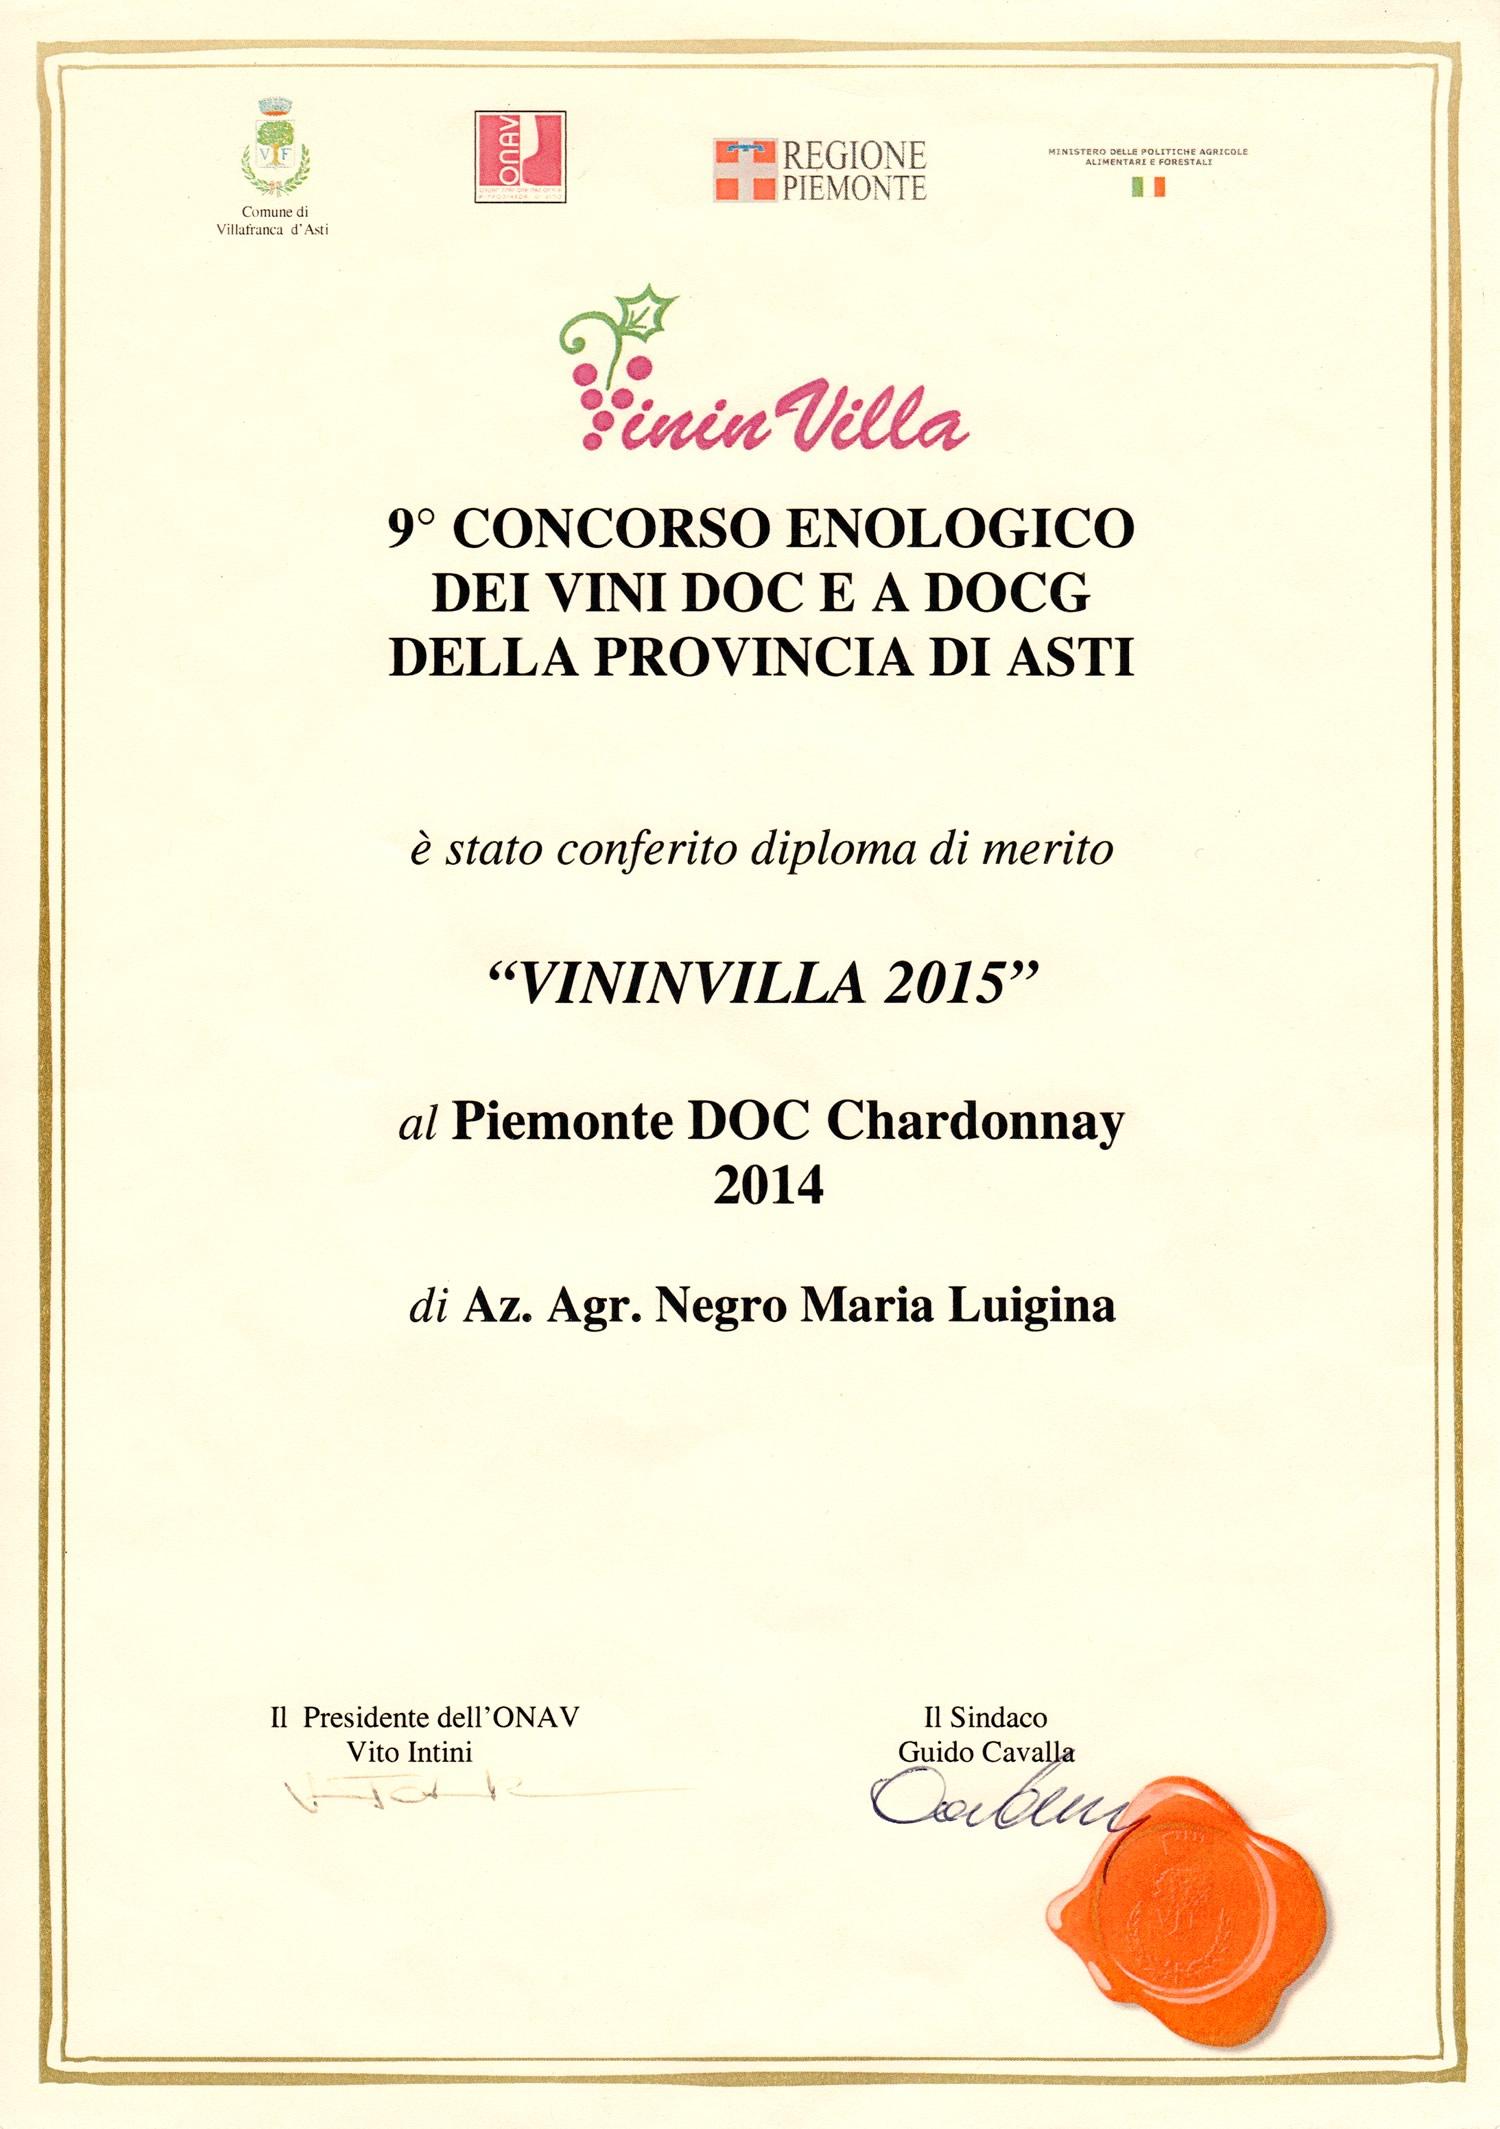 VininVilla 2015 - Piemonte D.O.C. Chardonnay 2014.